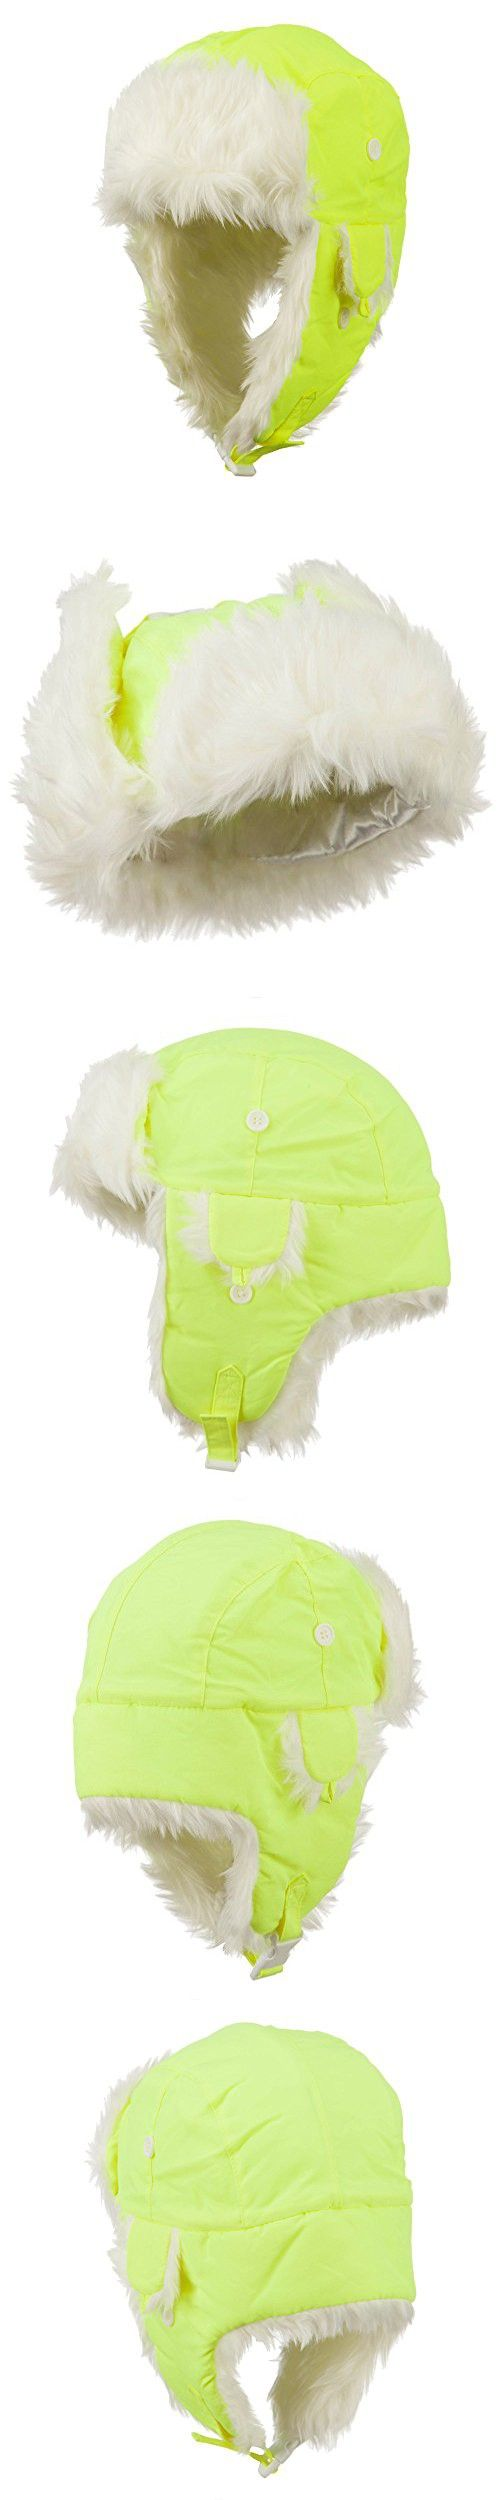 Neon Faux Fur Aviator Trooper Hat - Neon Yellow S-M